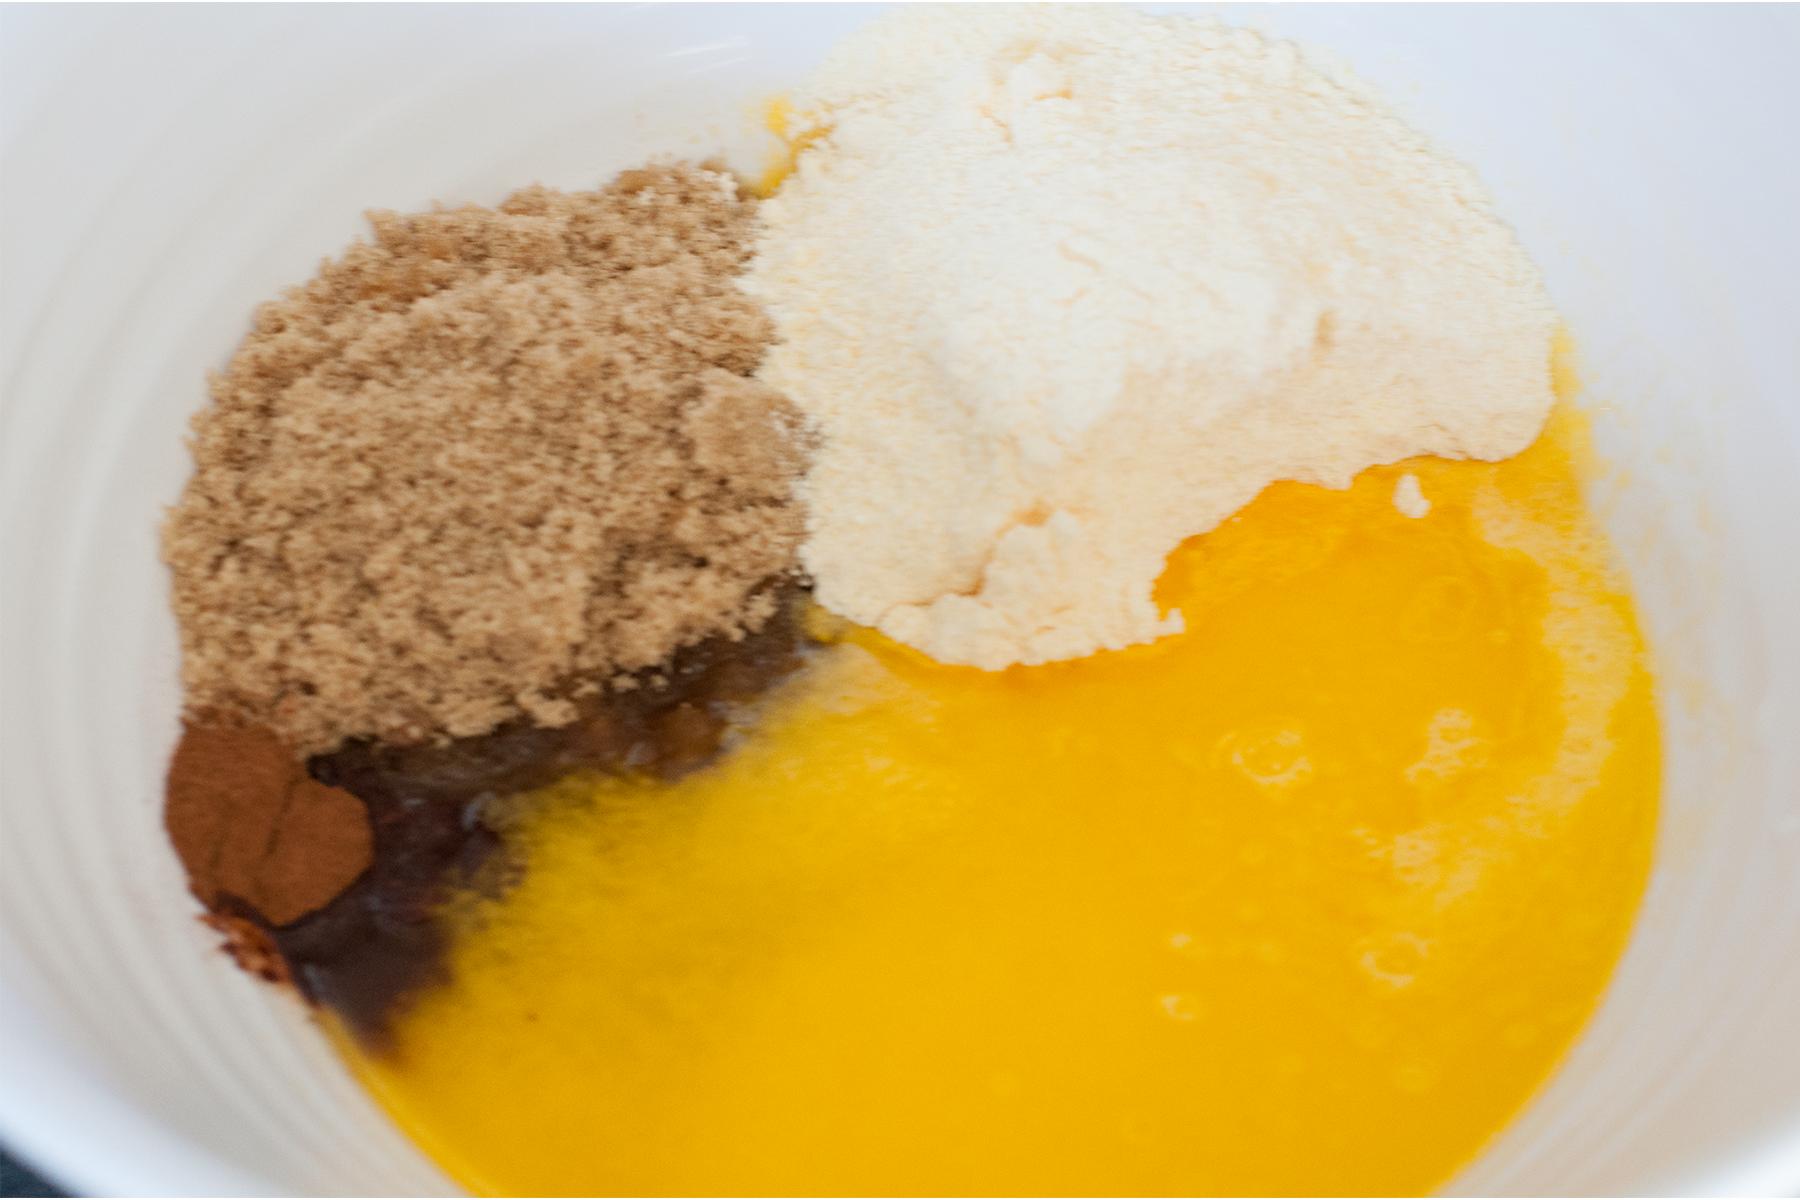 caramel sauce ingredients - feature image